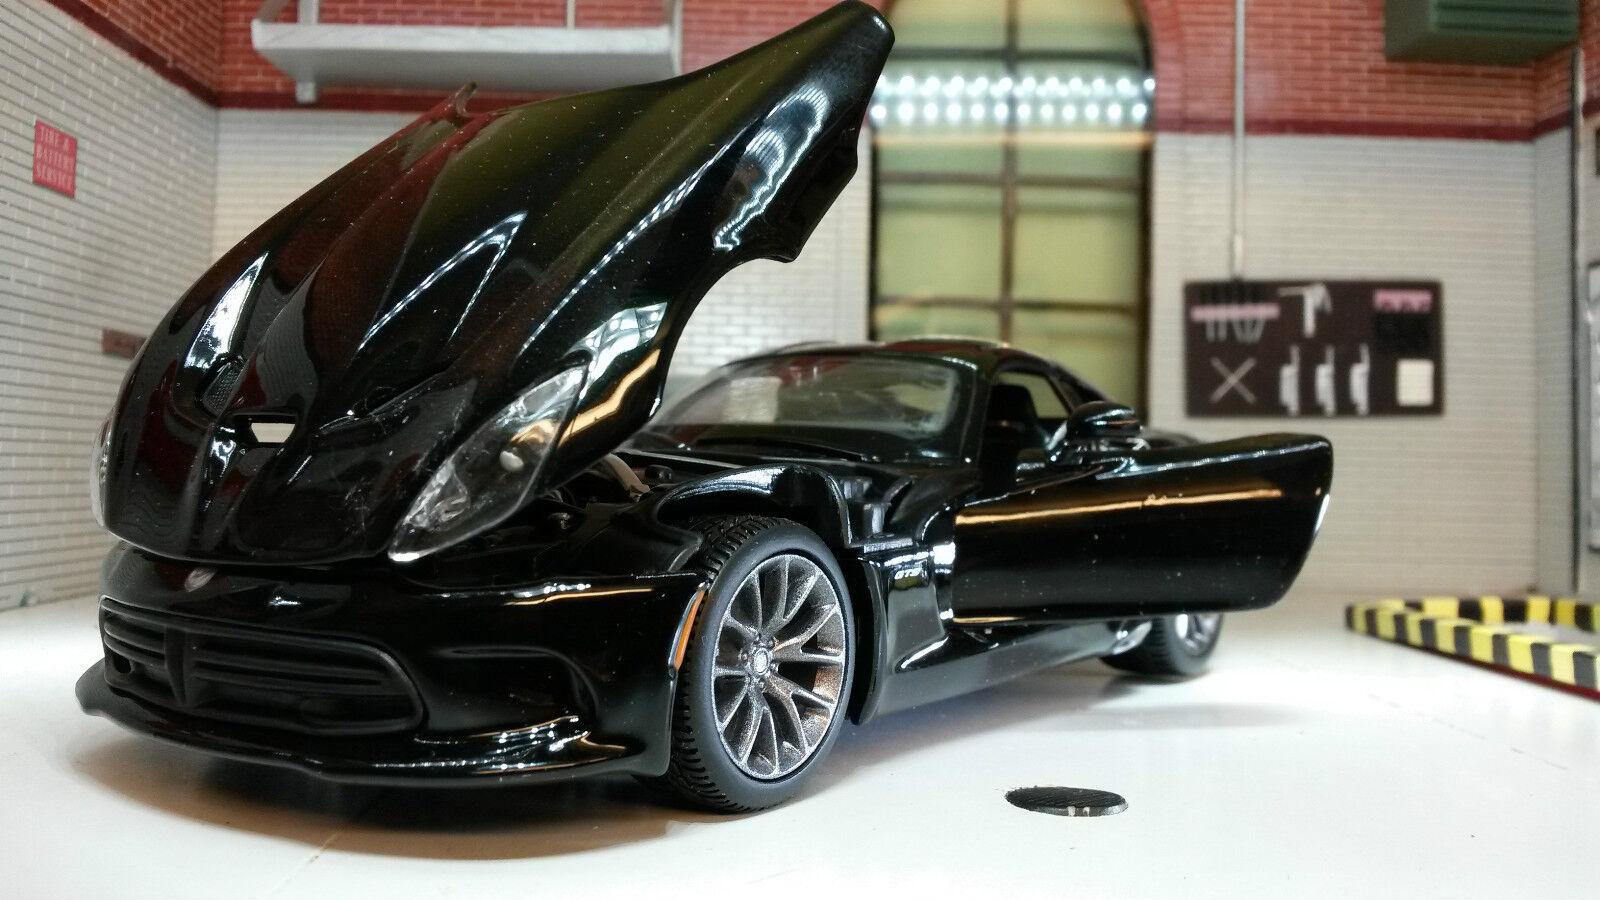 G 1 24 Echelle Noir Chrysler Dodge Viper SRT 2013 GTS Maisto Voiture Miniature